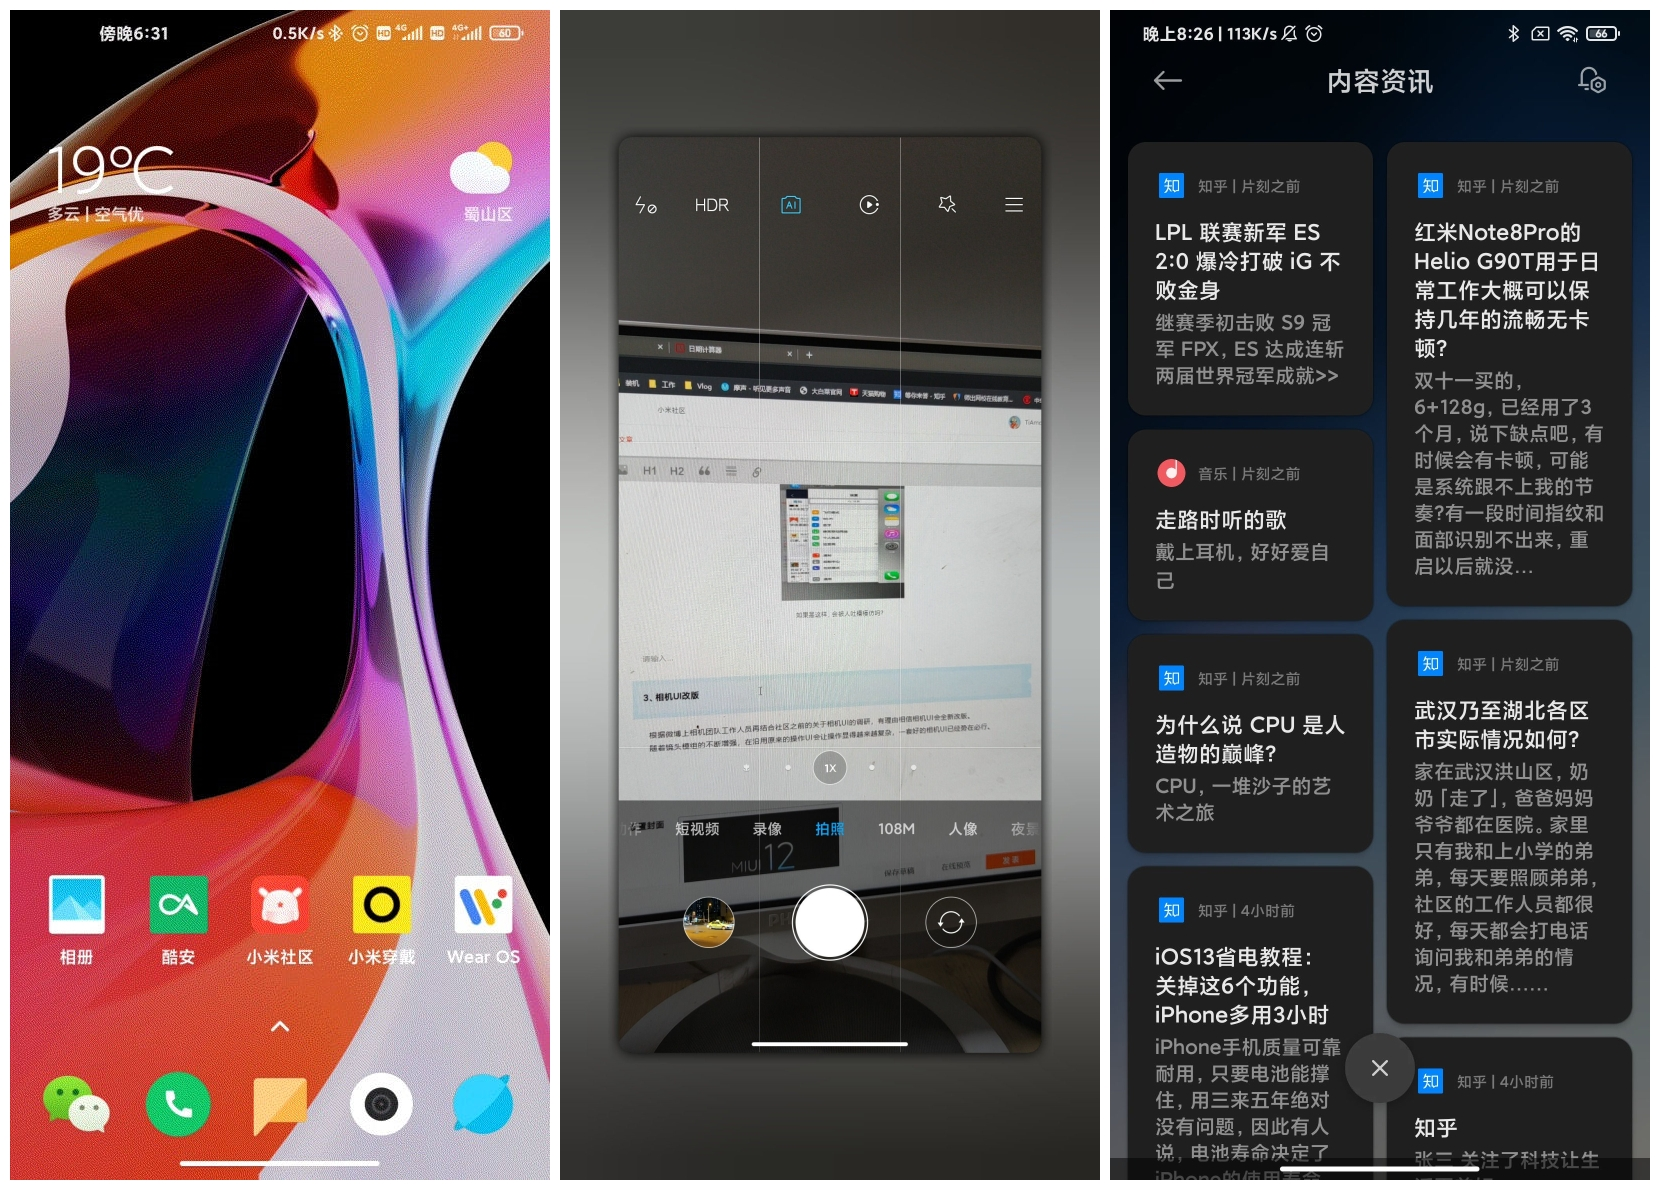 MIUI 12开发版首批截图曝光:相机/手势/通知/广告等大量改进